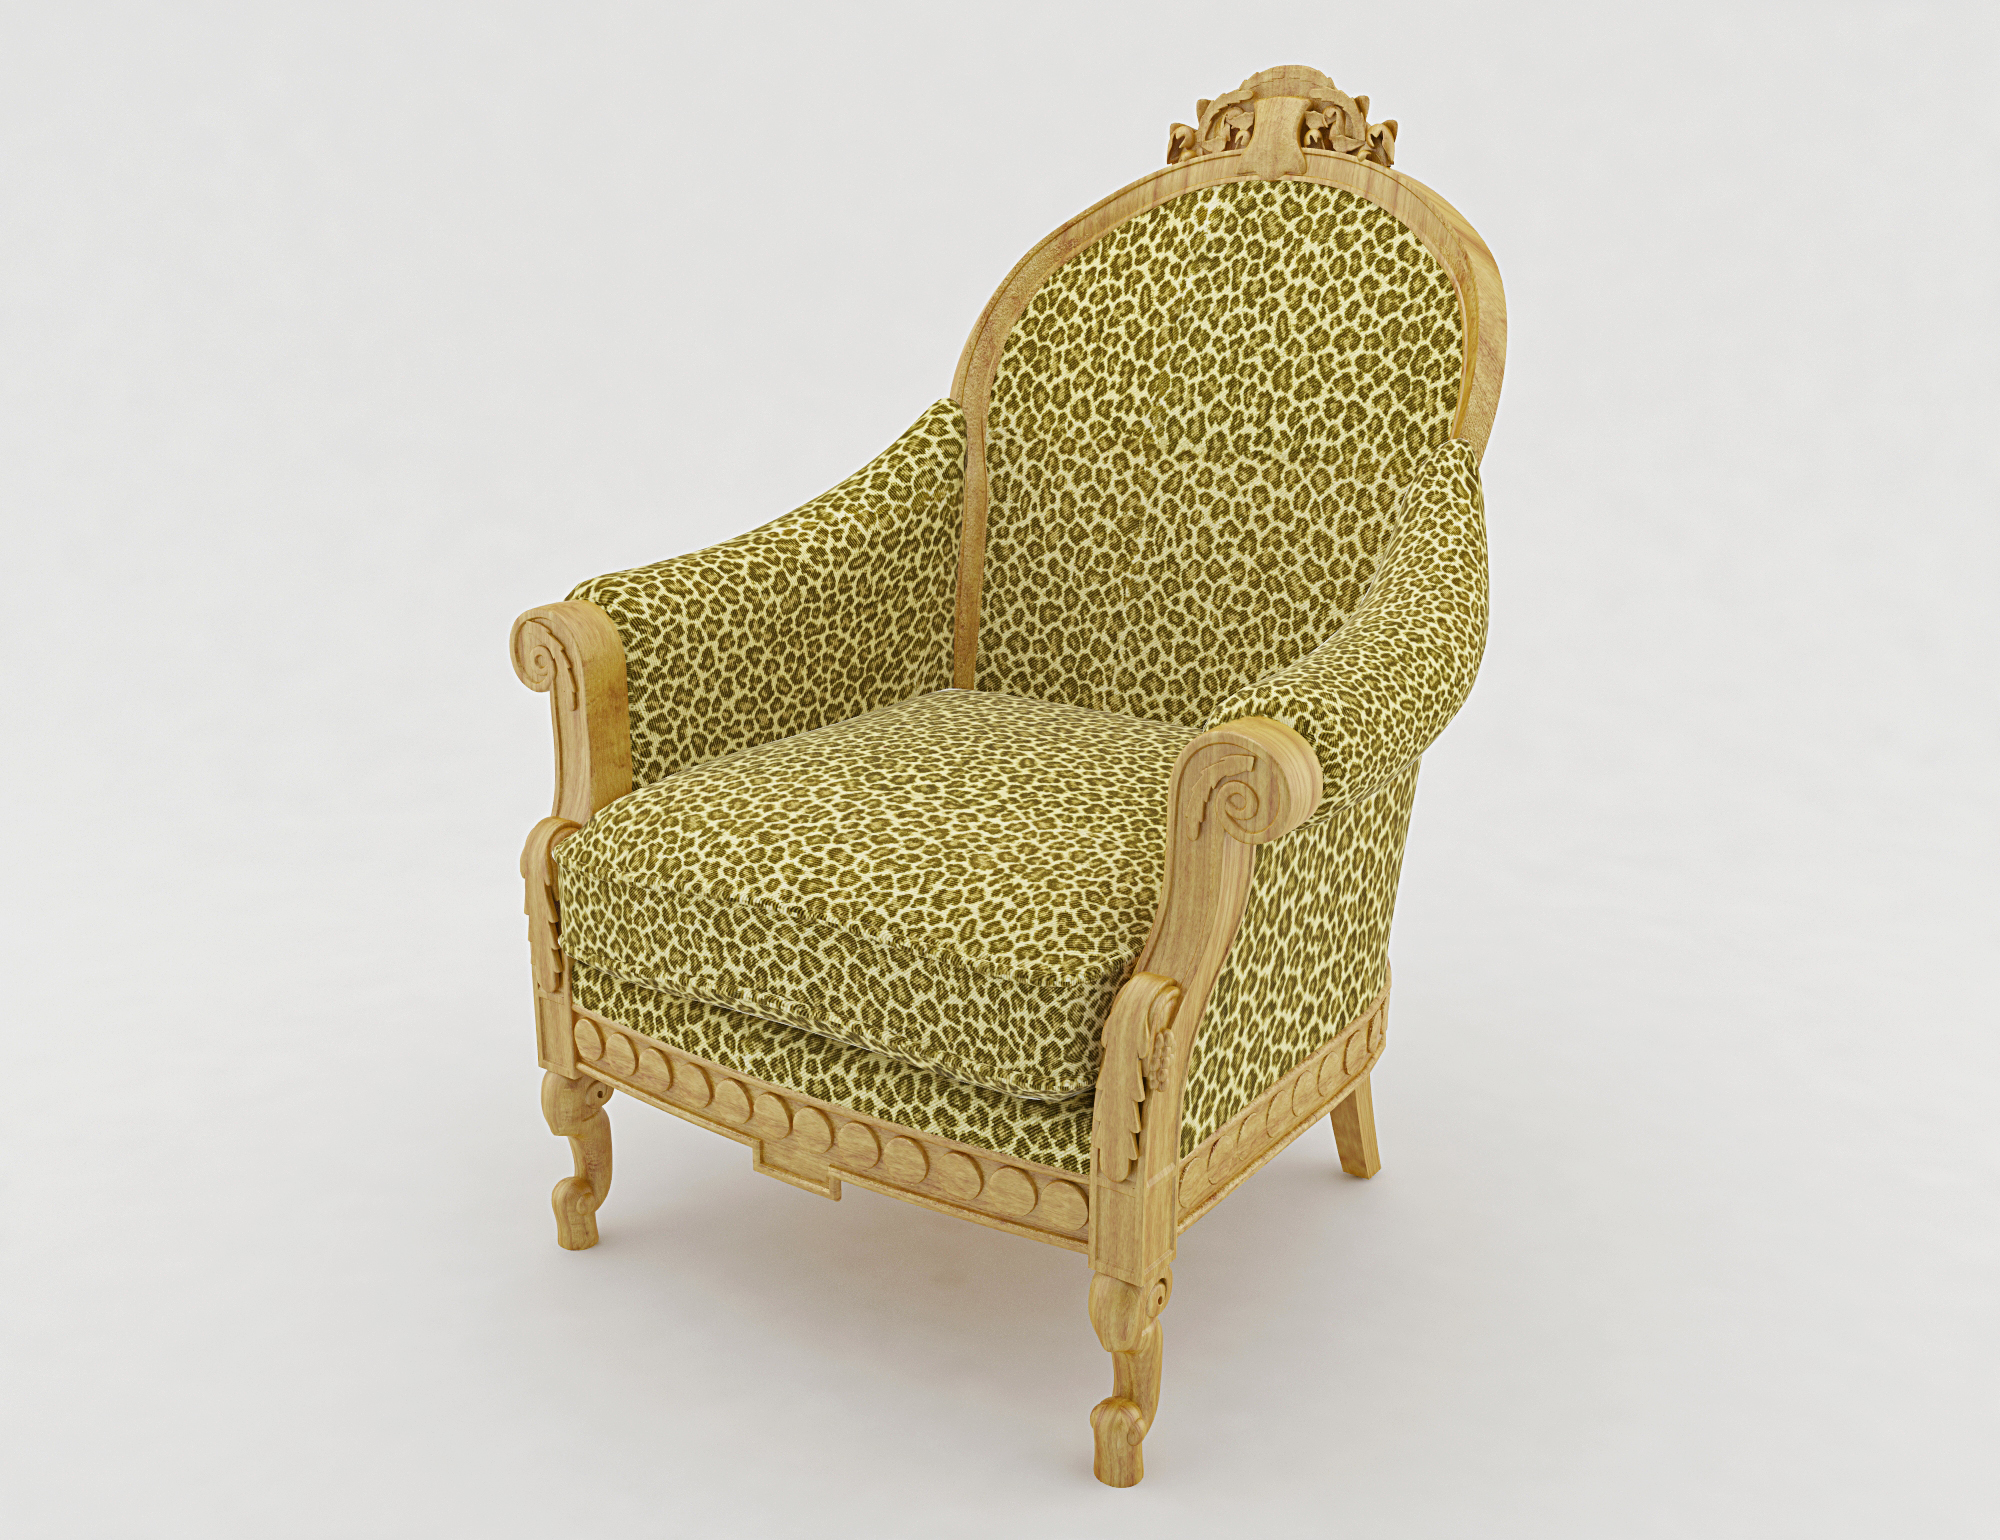 кресло2.jpg